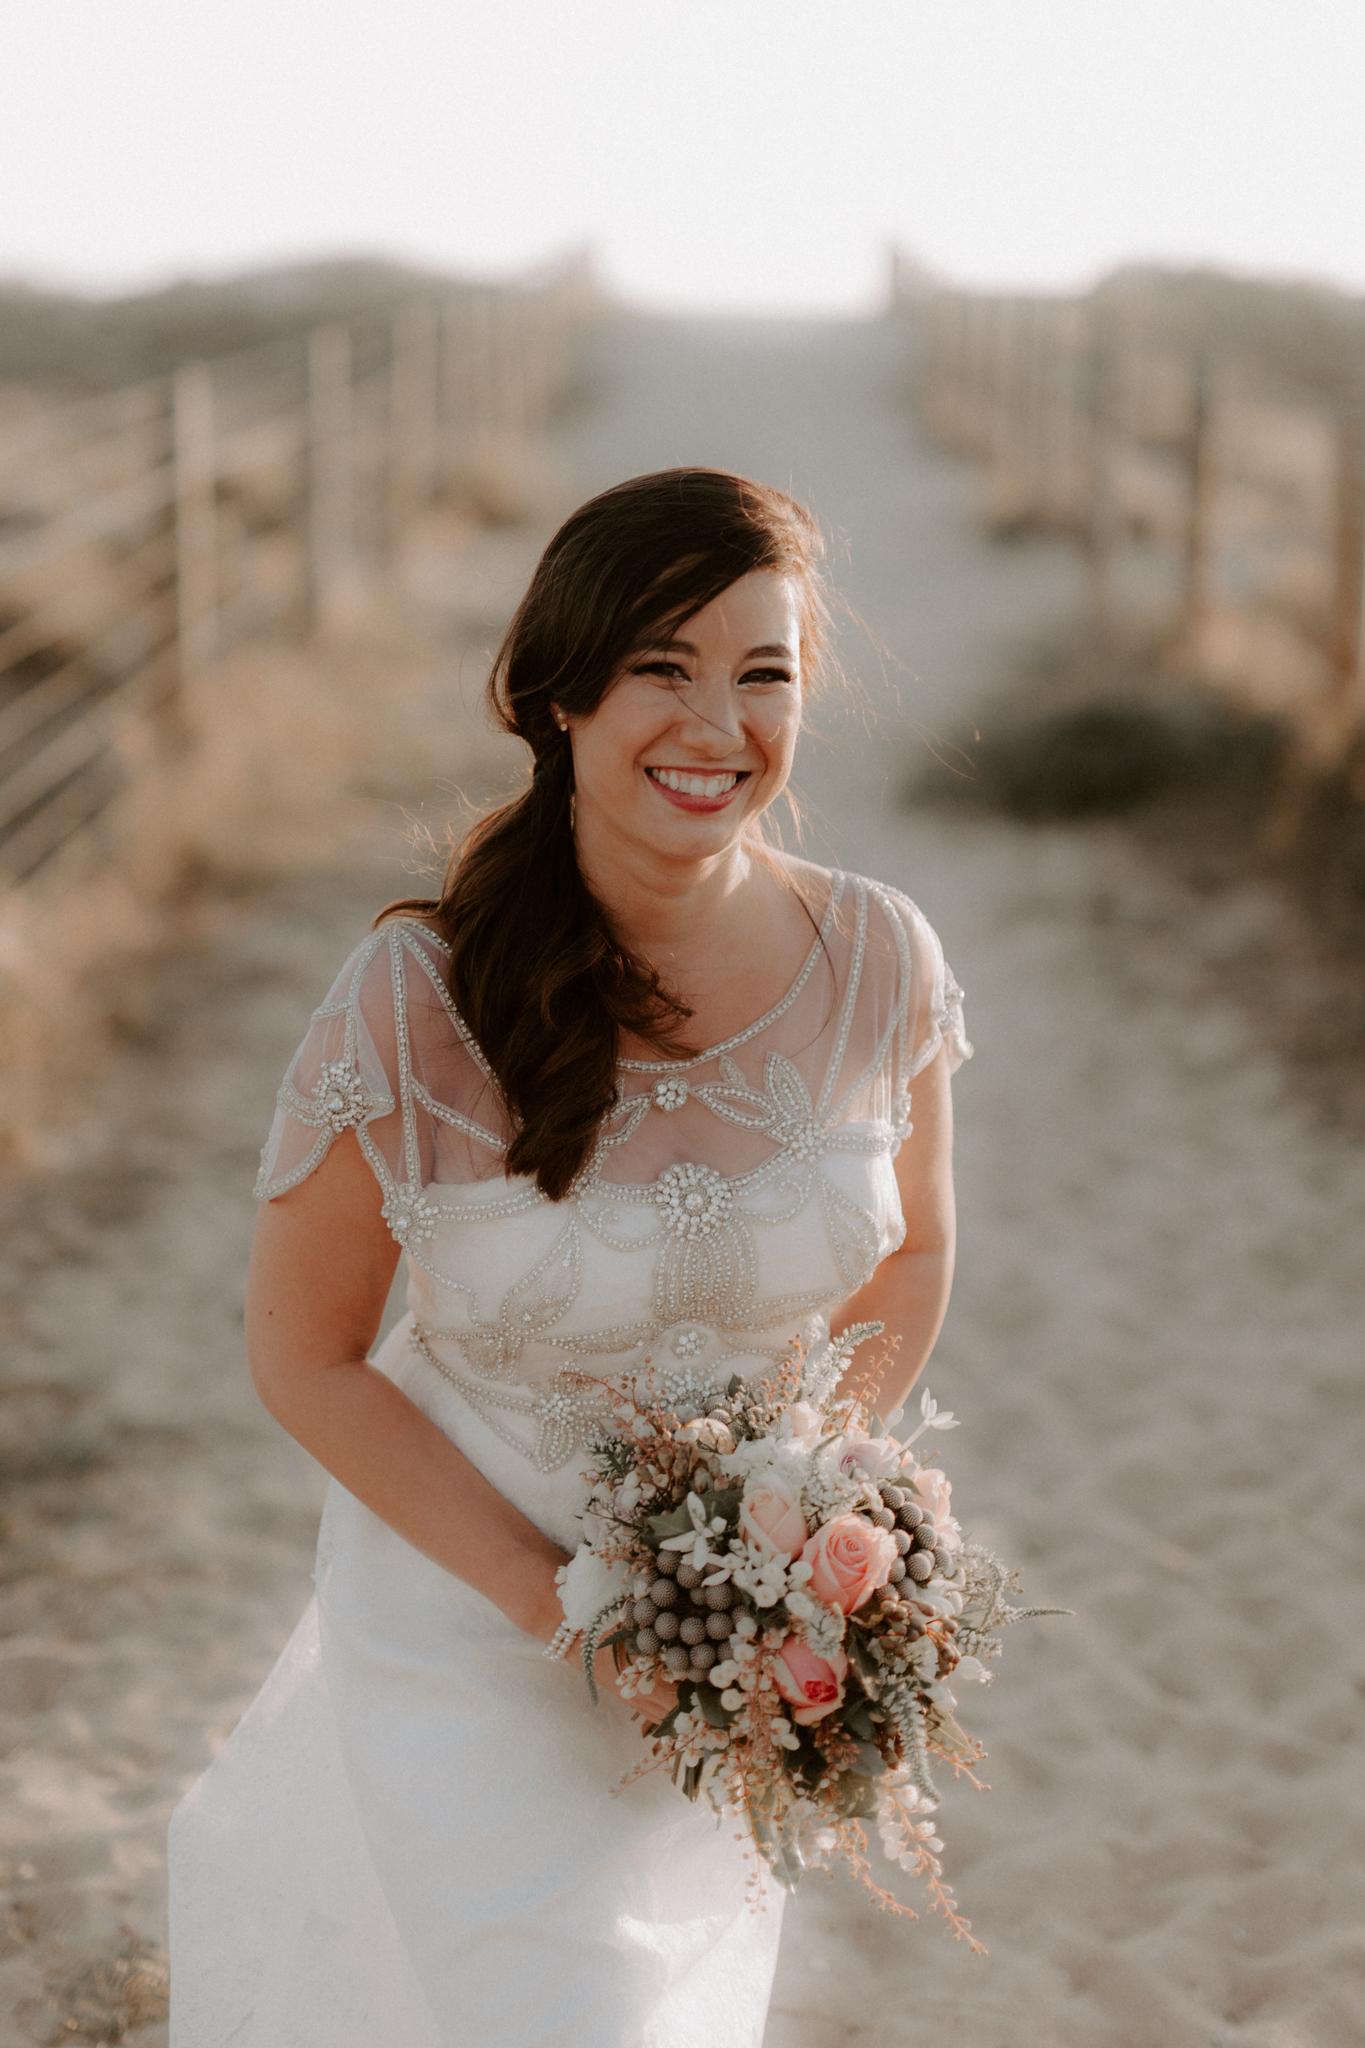 St-Ali-Wedding-Emotions-and-Math-Photography-061.jpg